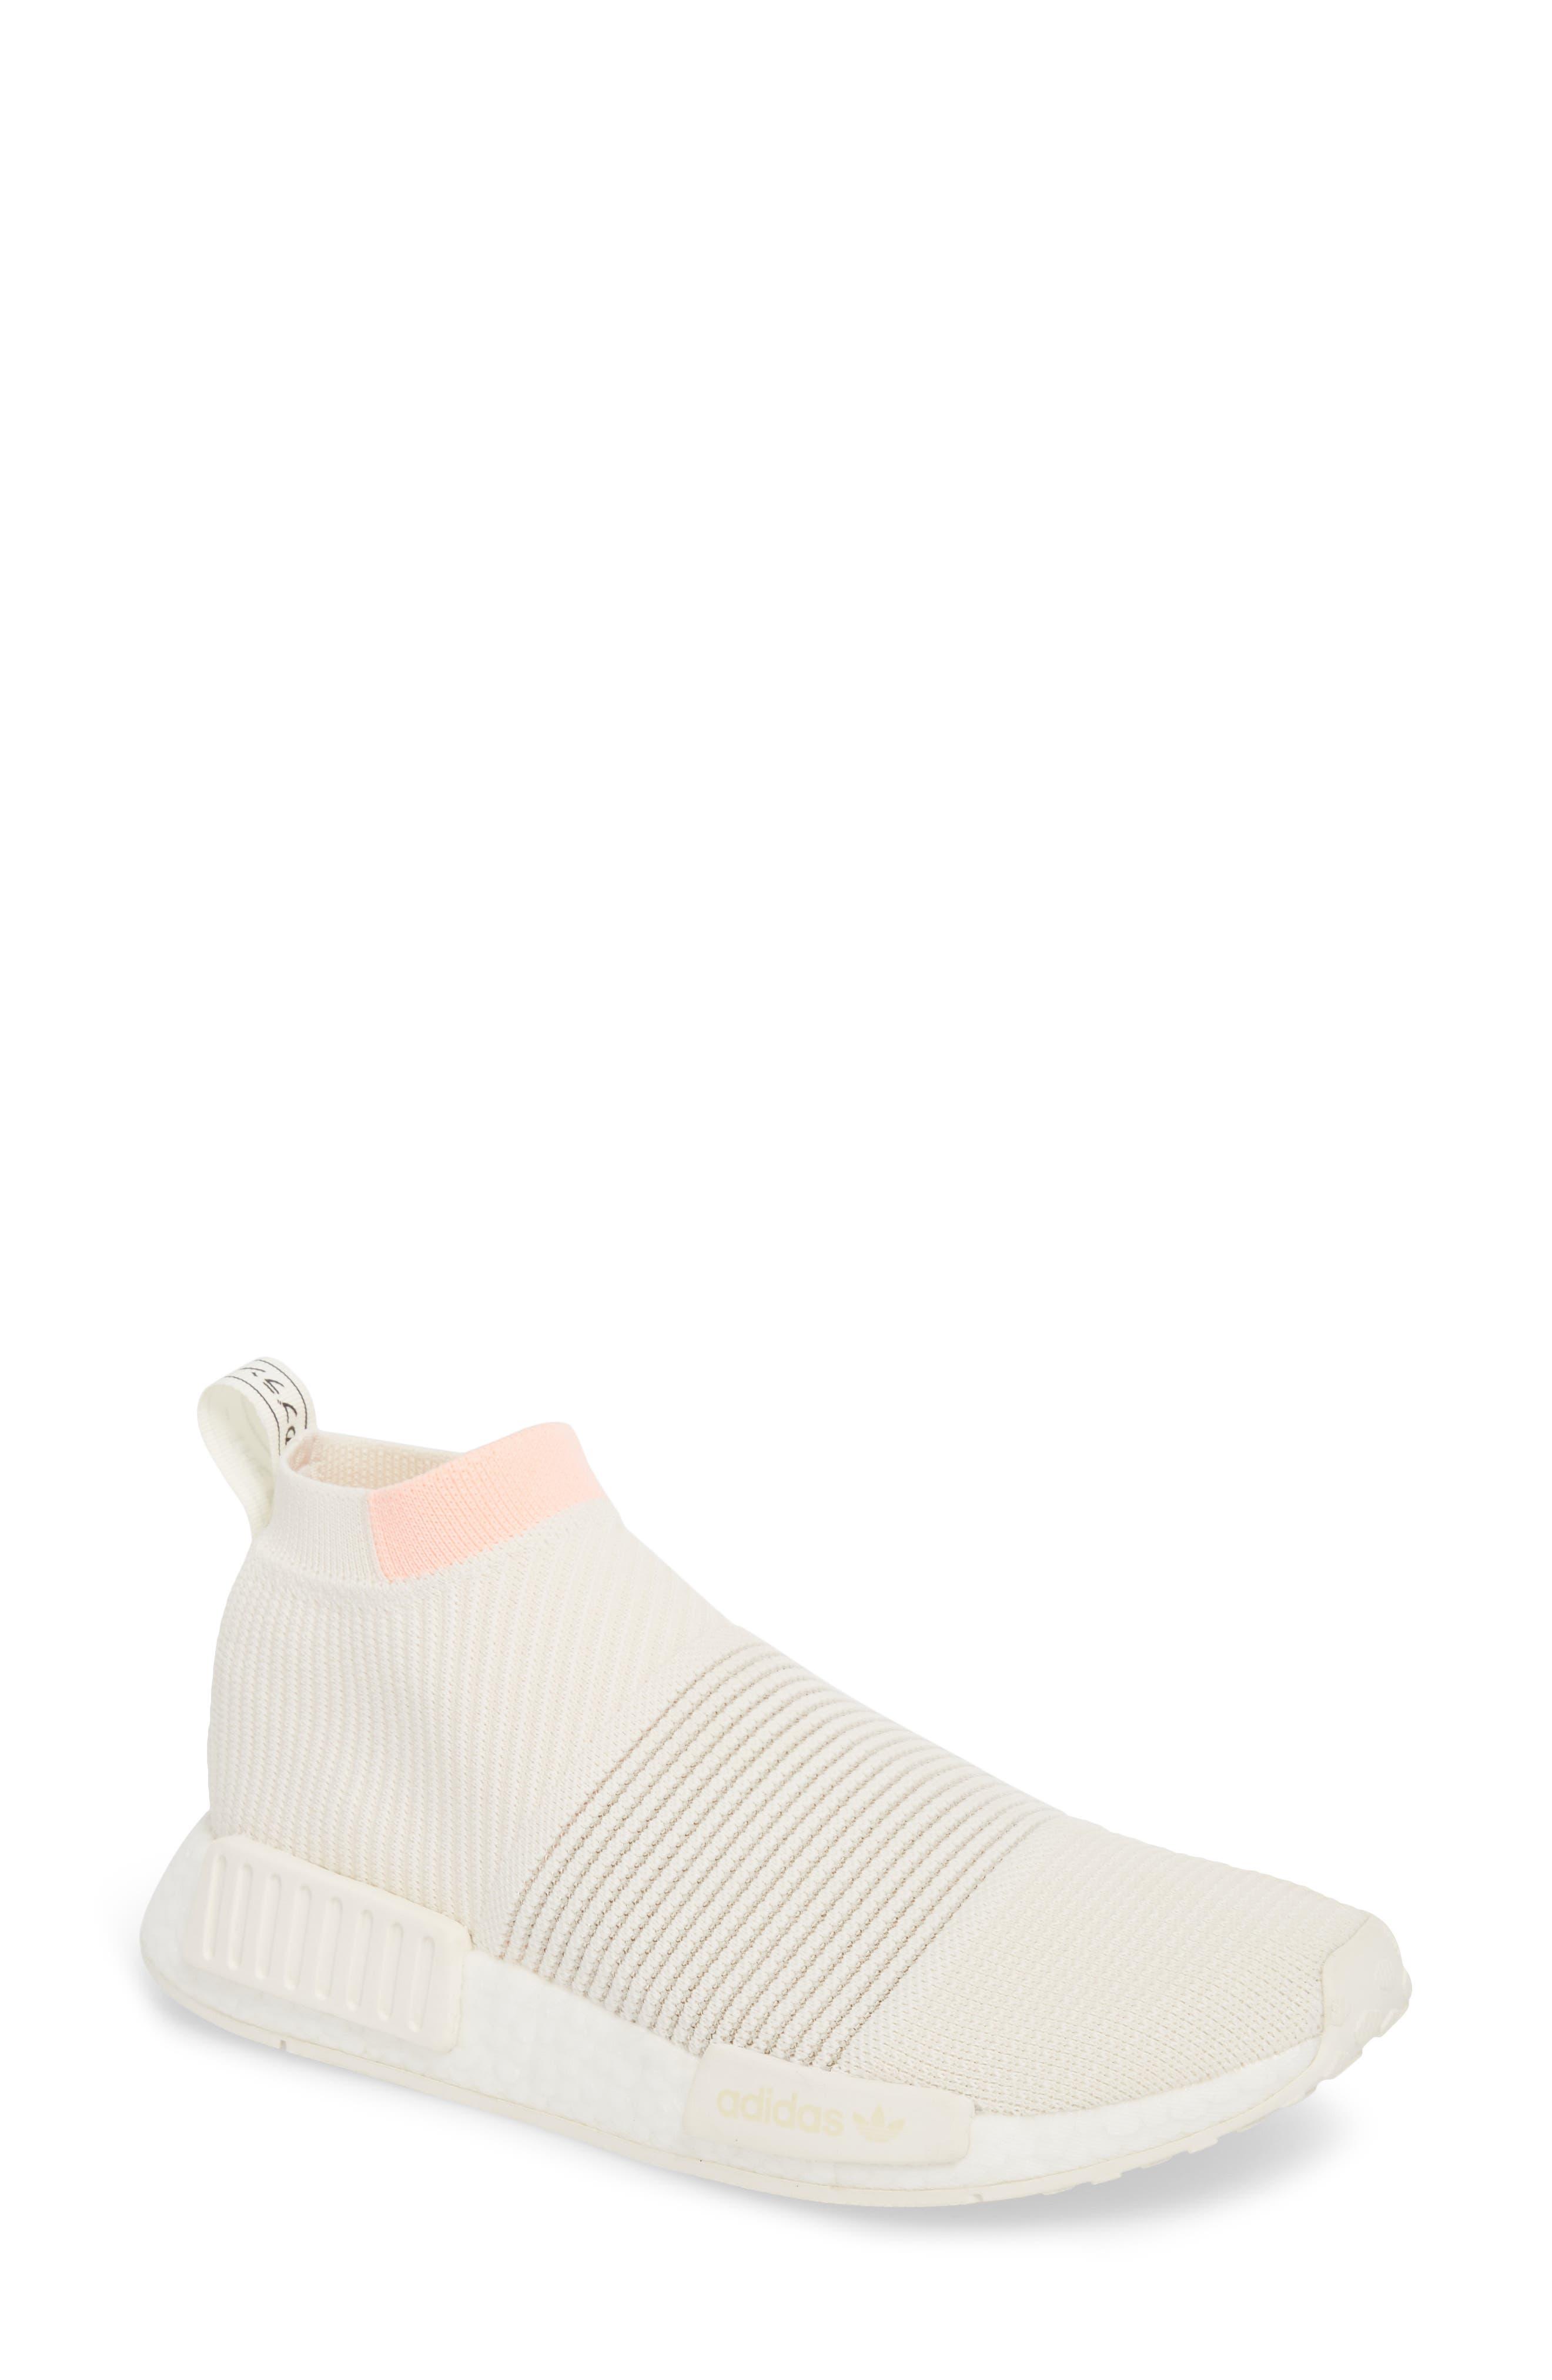 NMD_CS1 Primeknit Sneaker,                         Main,                         color, CLOUD WHITE/ CLEAR ORANGE